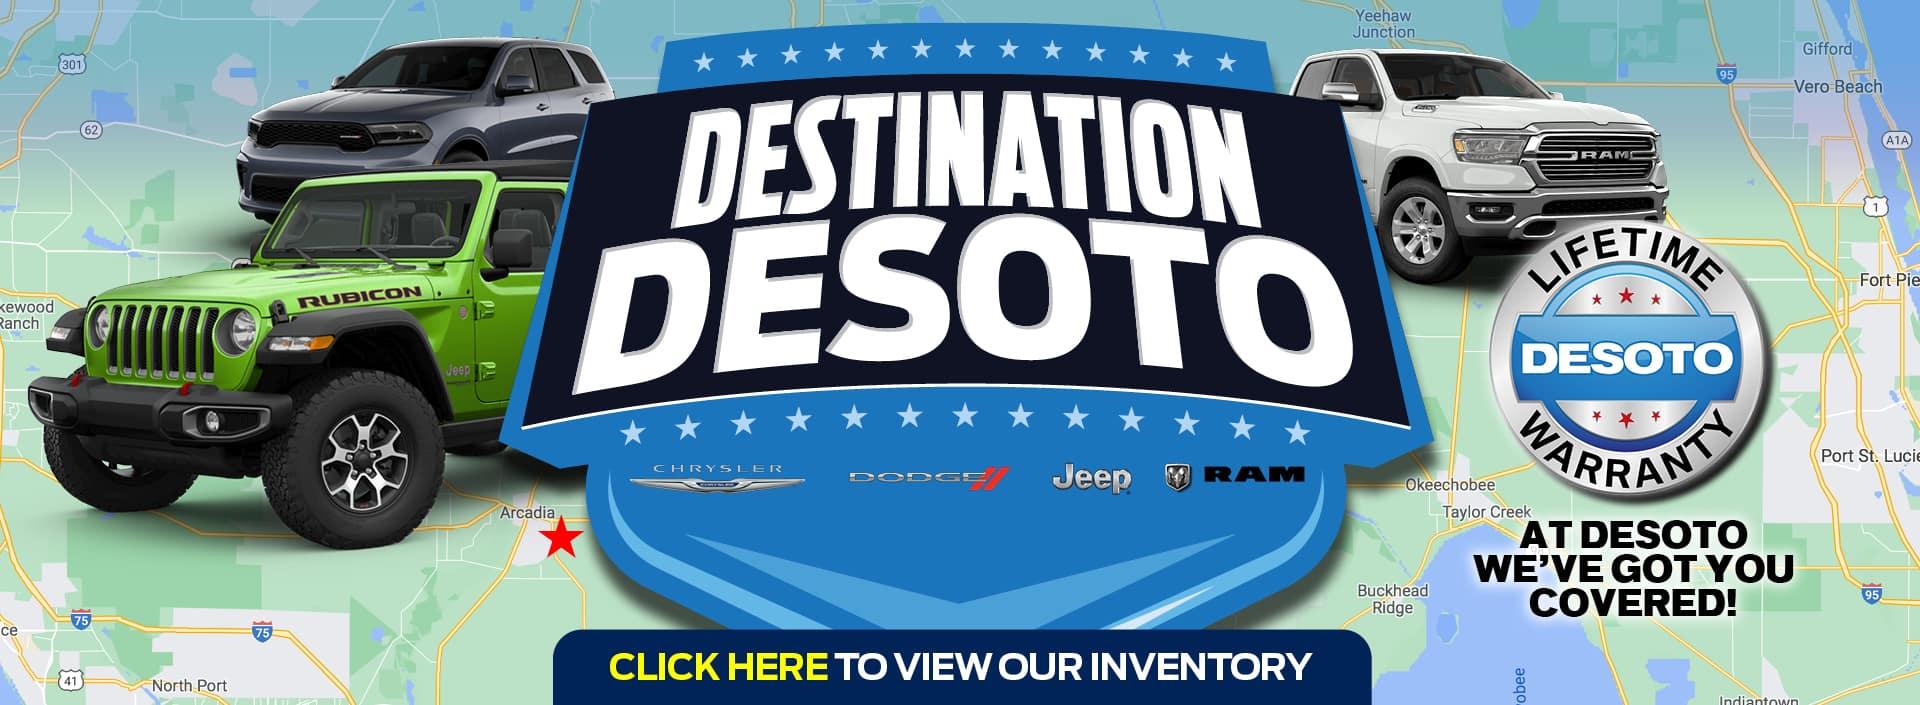 Destination DESOTO